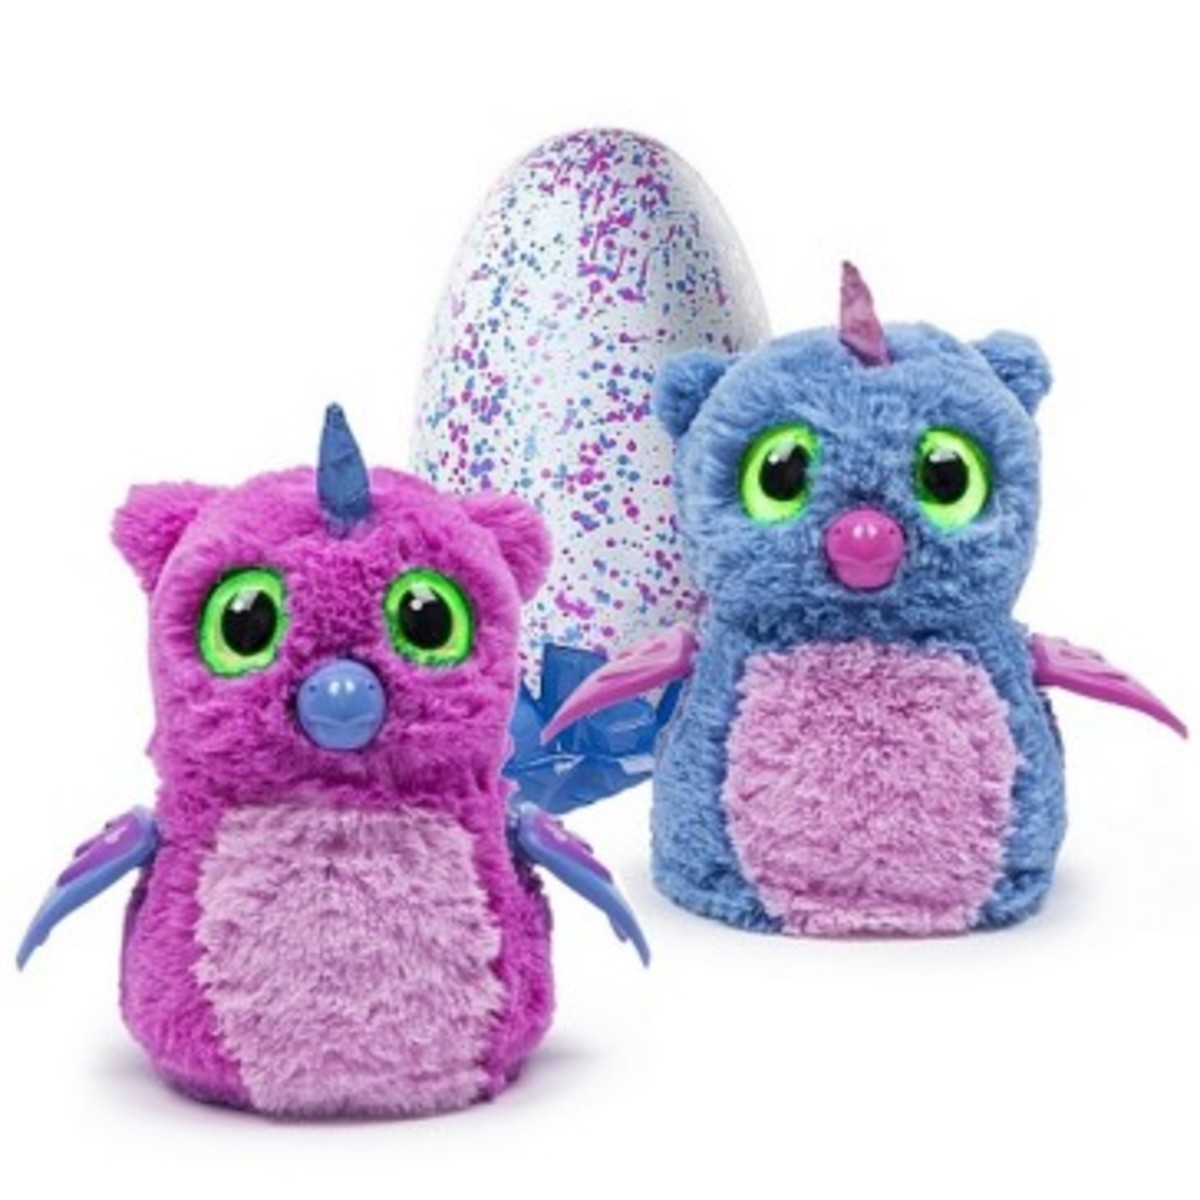 An Owlicorn is a cross between an Owl and a Unicorn